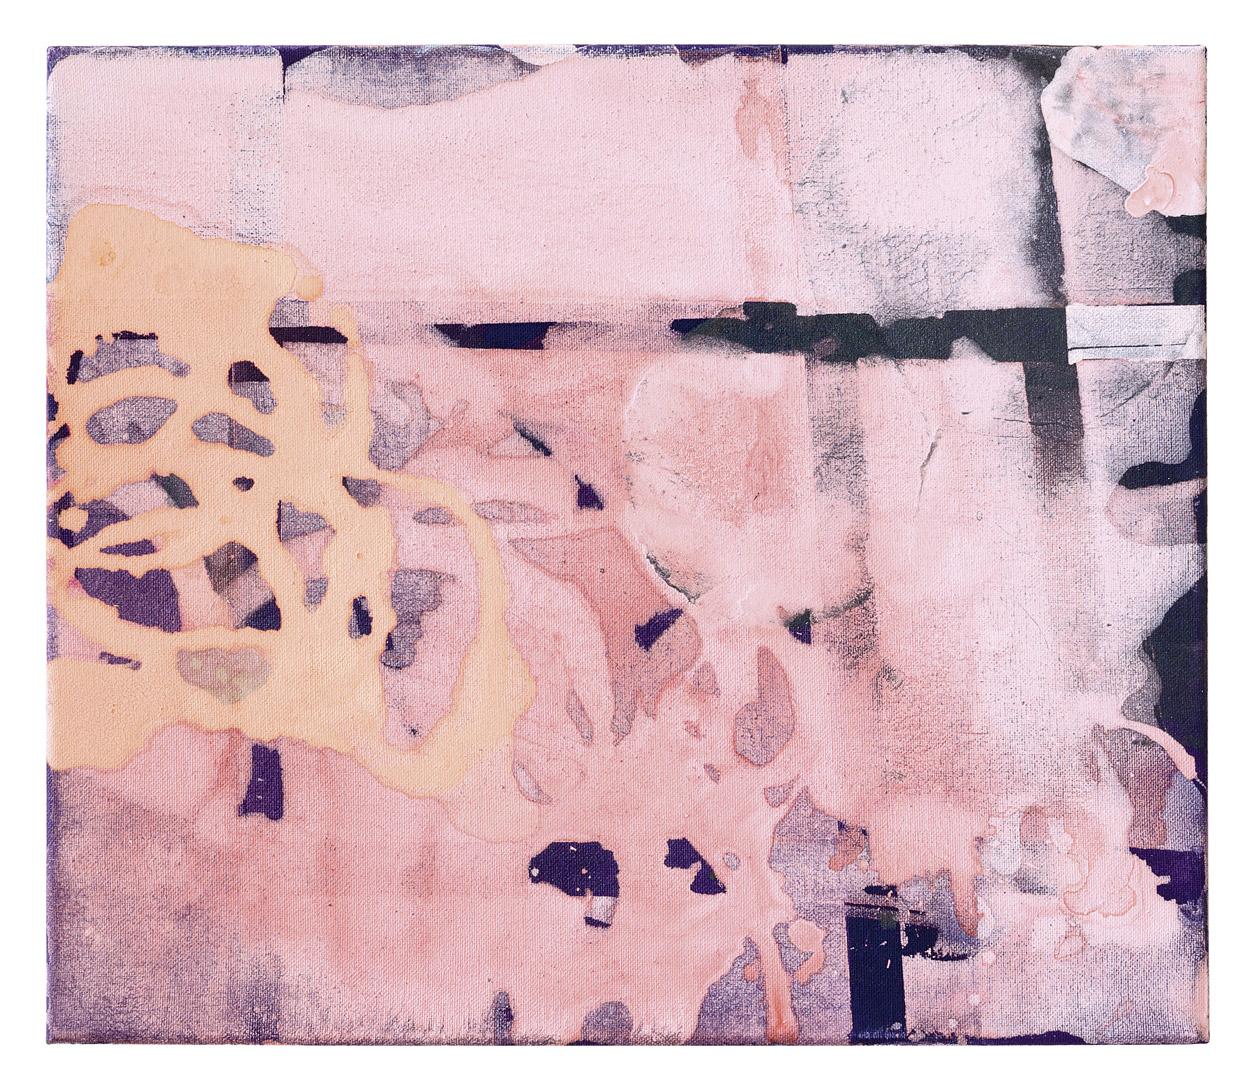 thomas bechinger, wpd 11, 2018, acryl/linen, 34 x 42 cm